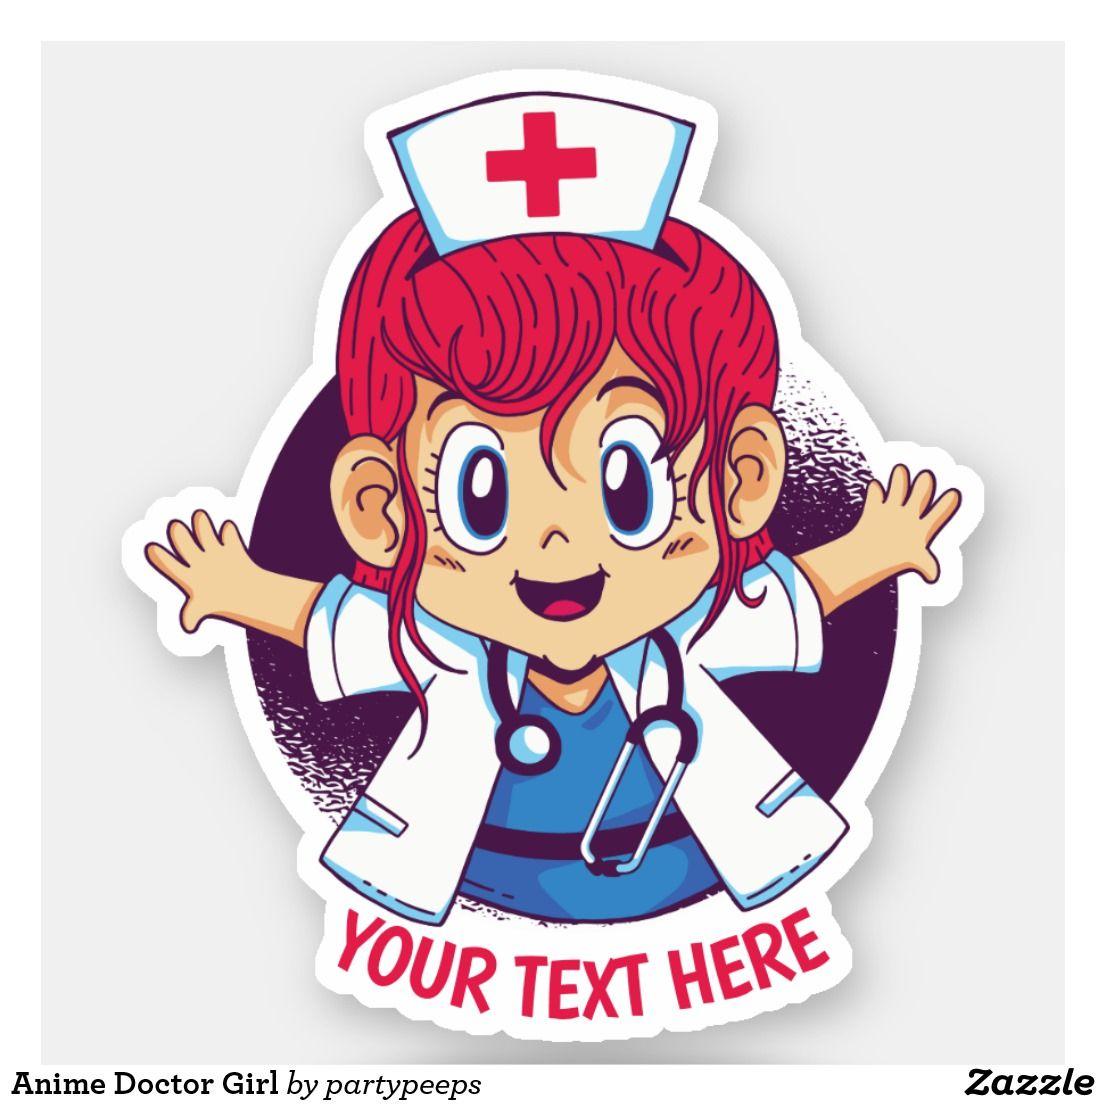 Anime doctor girl sticker anime stickers anime